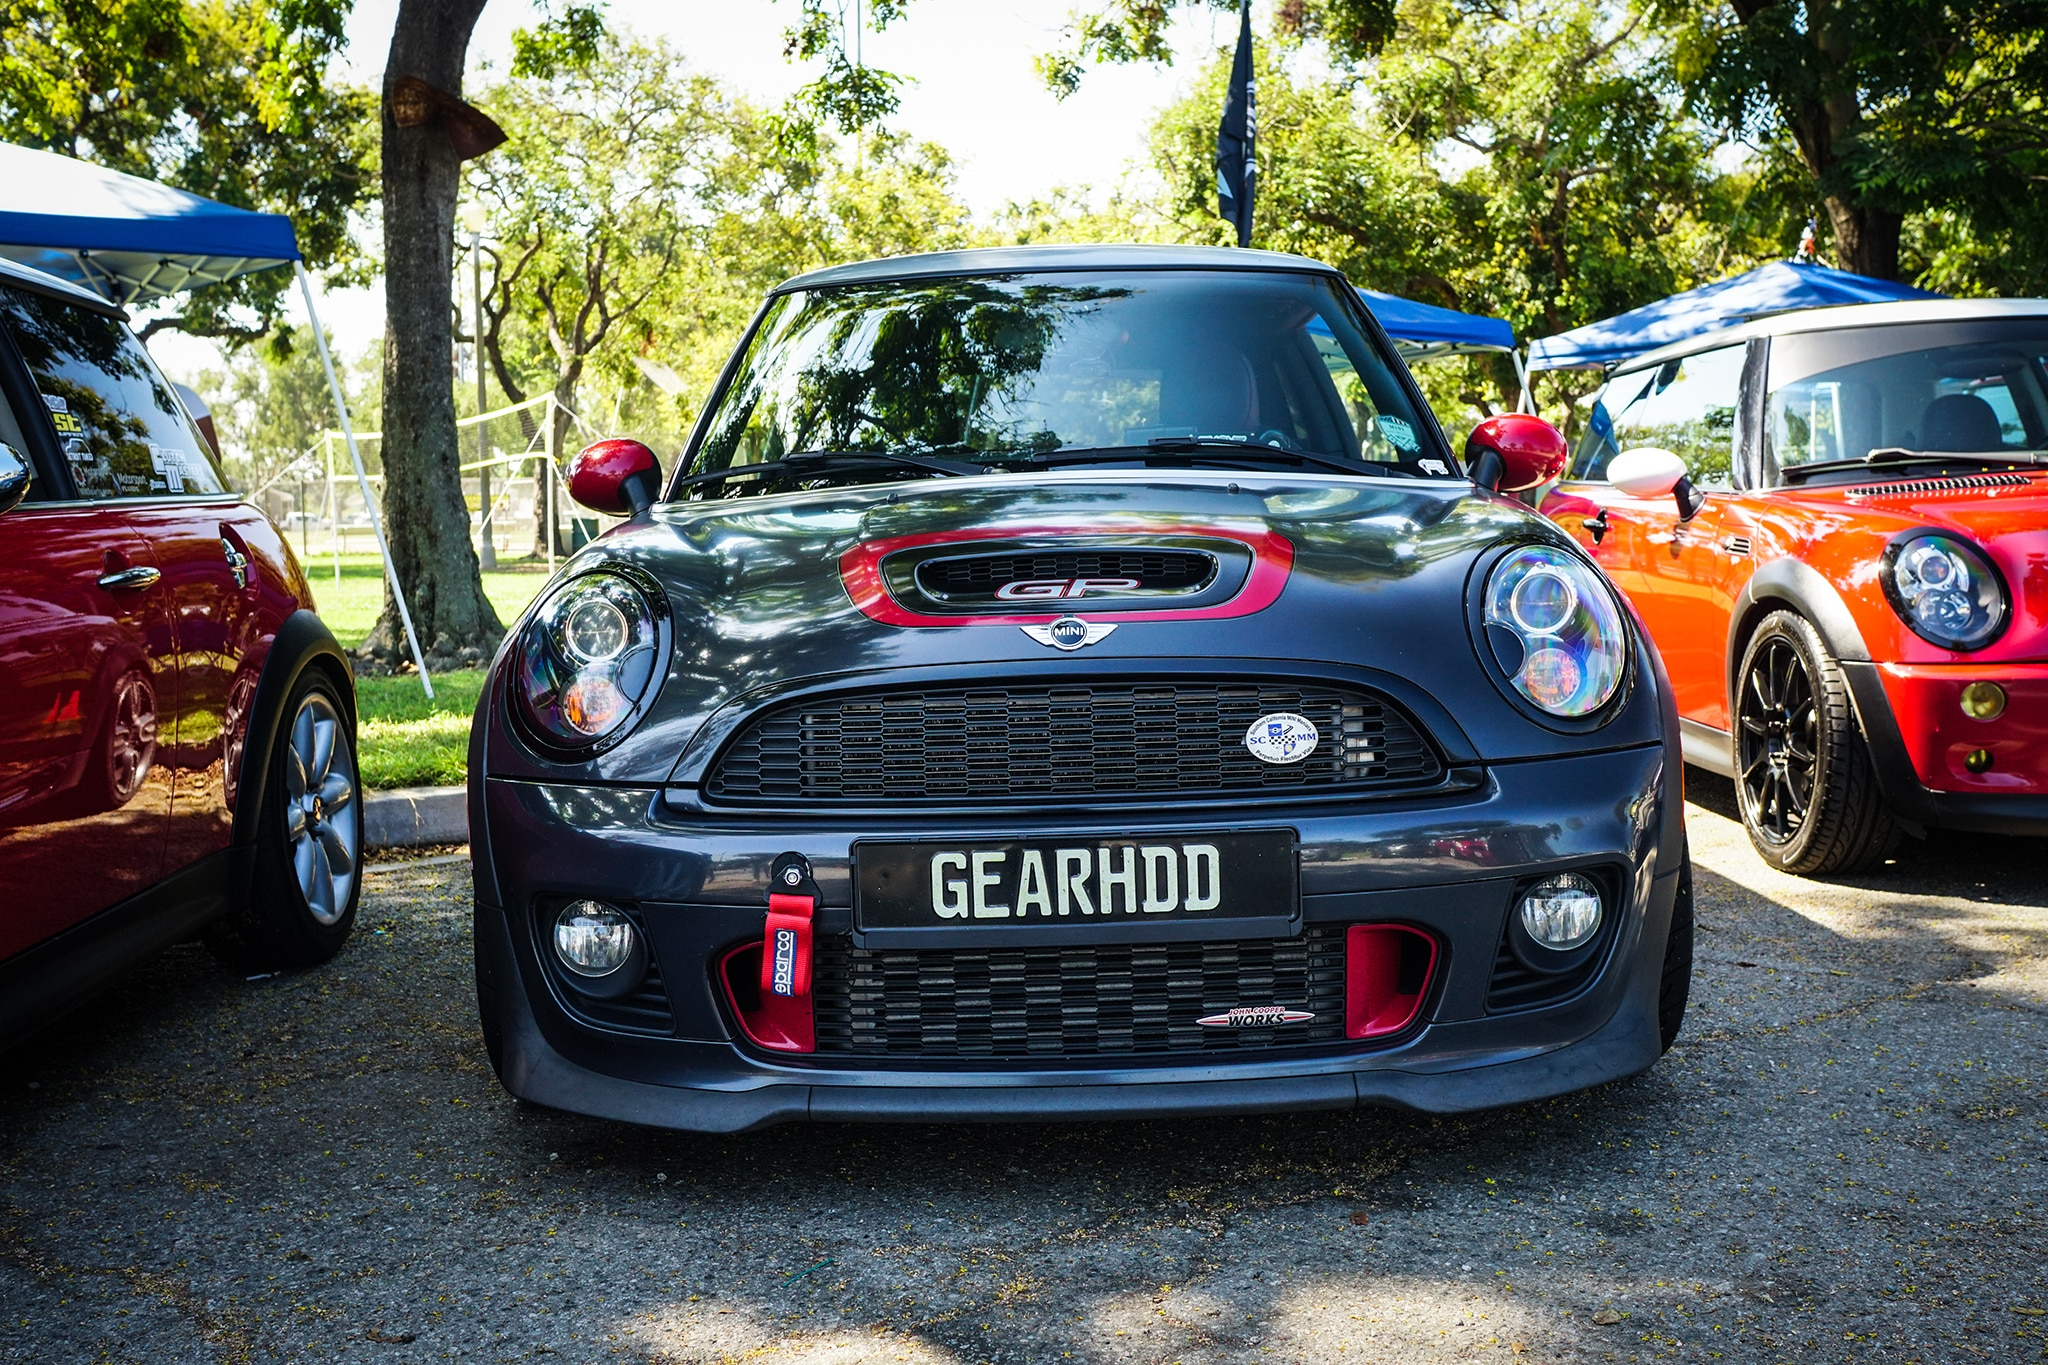 Mini Treasures At The Stancemini Car Club Meet Automobile Magazine